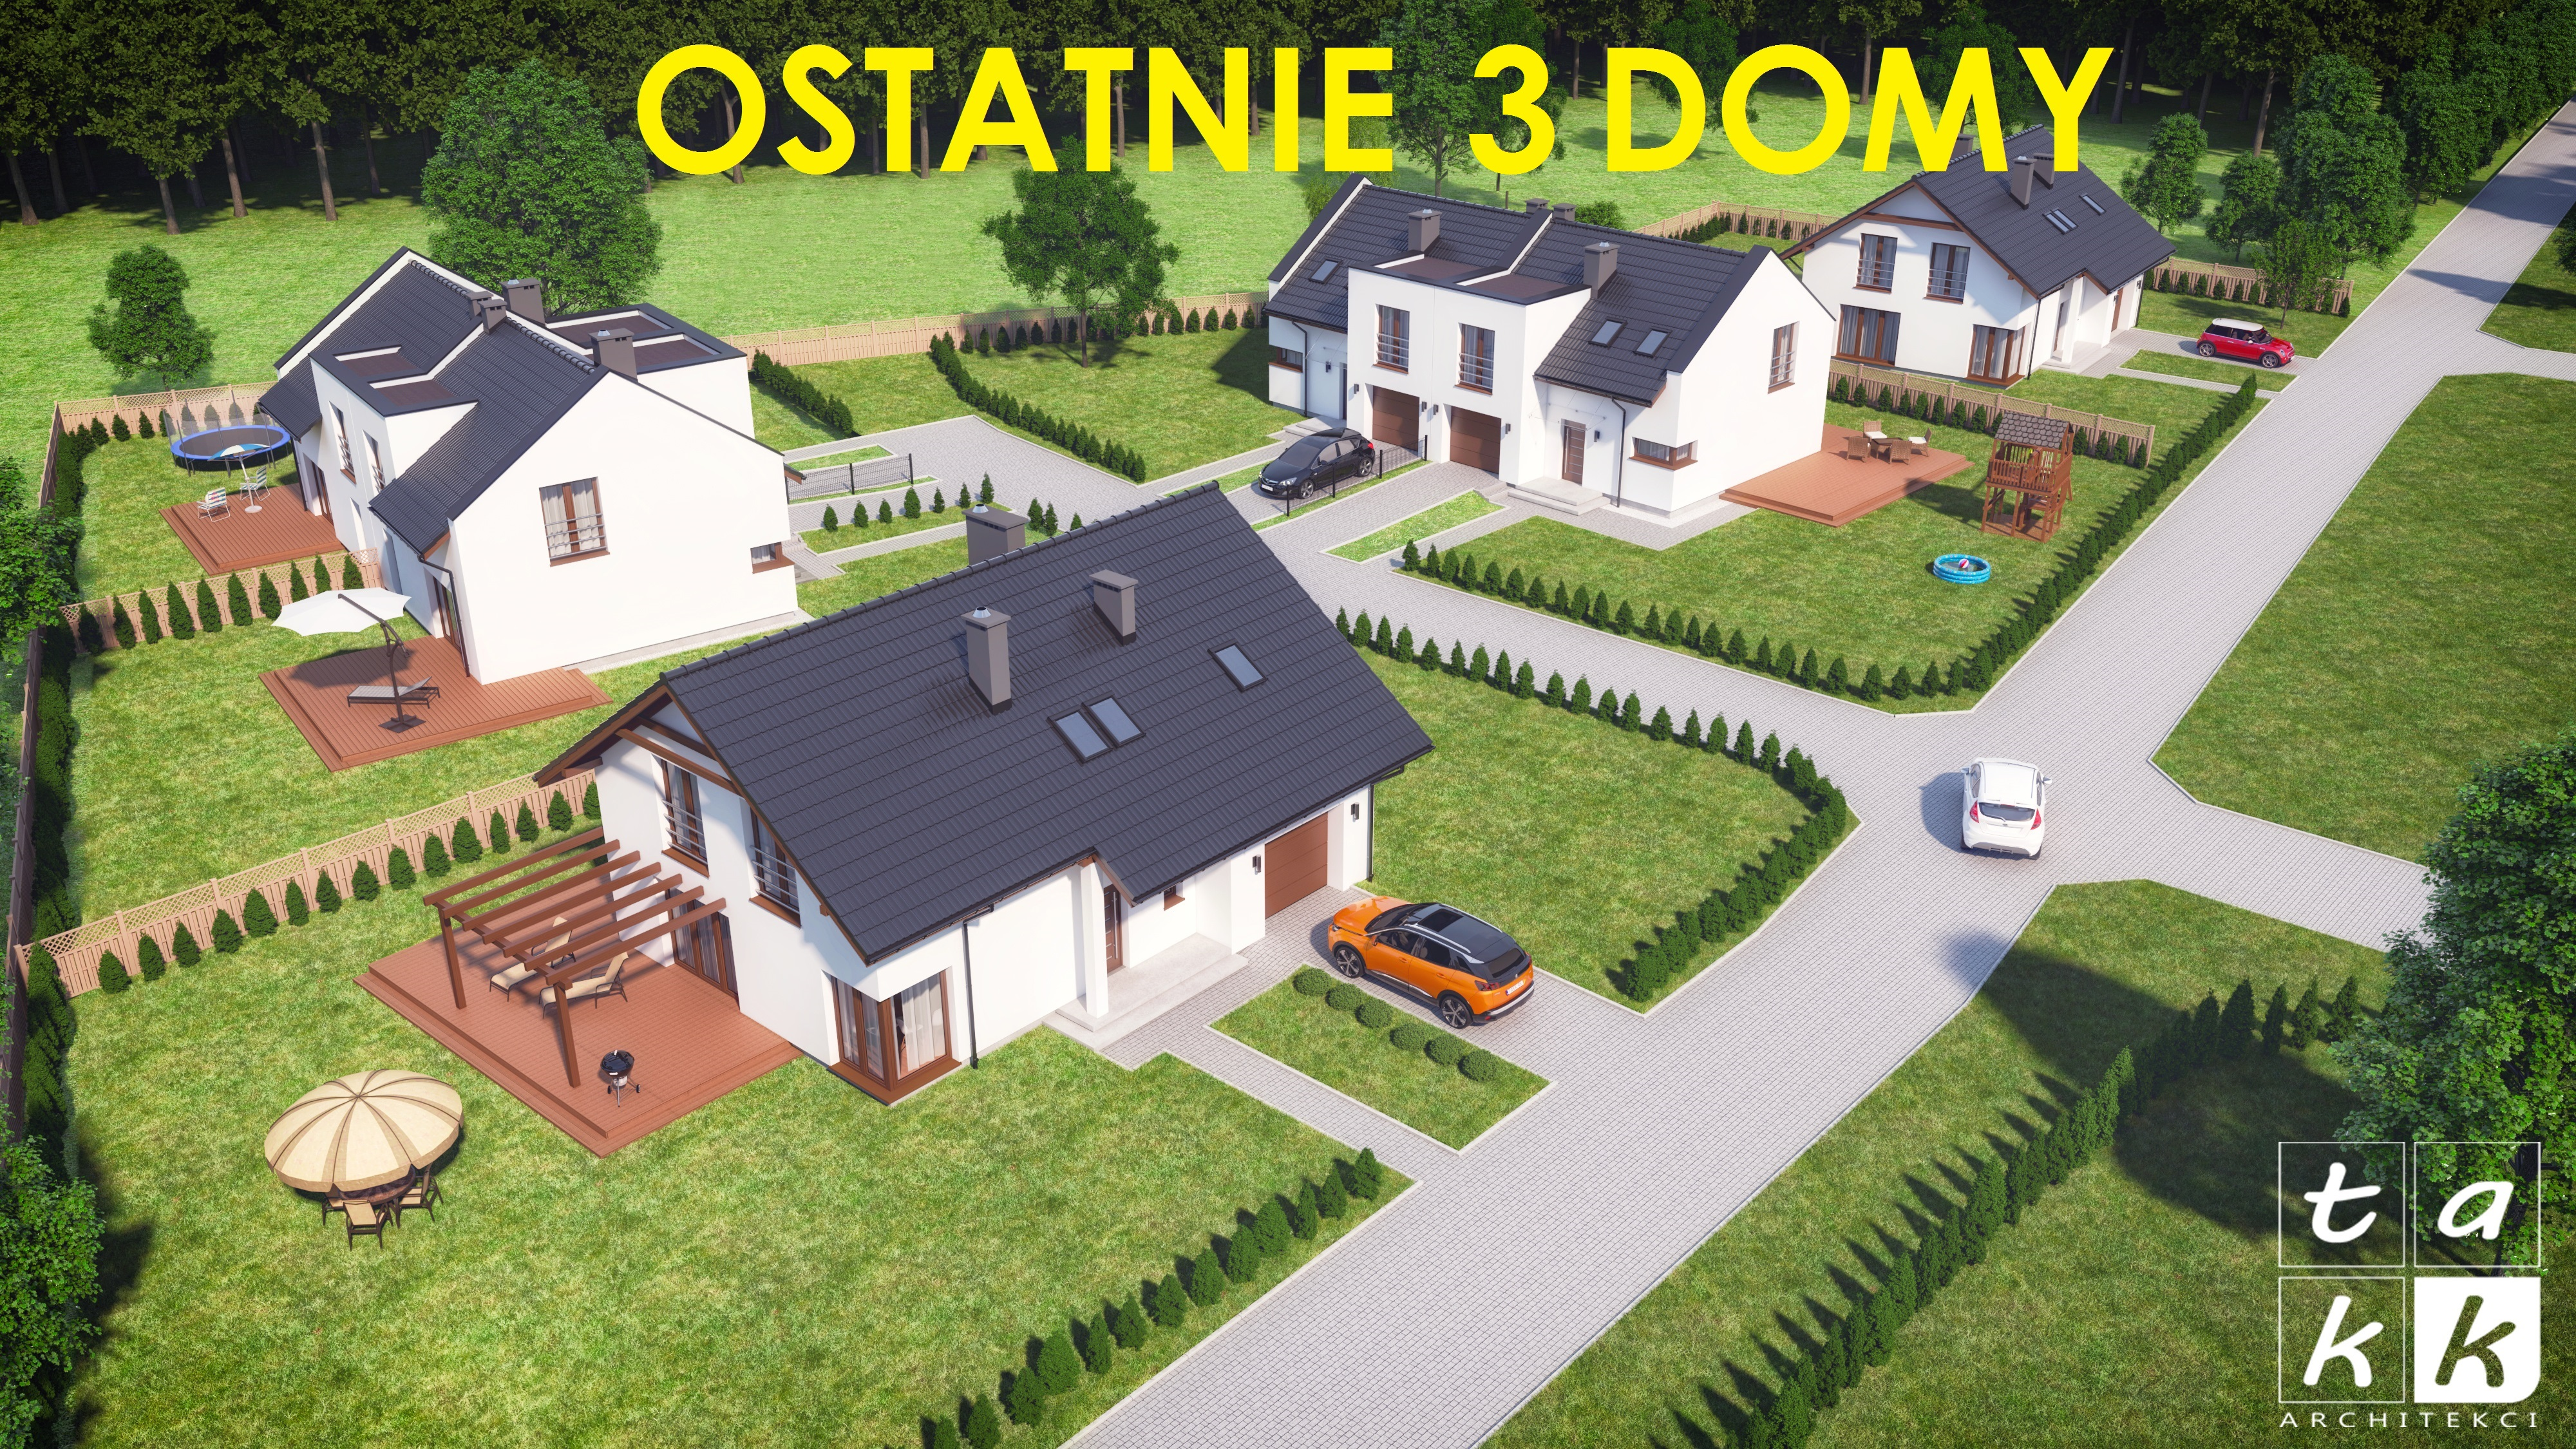 ostatnie 3 domy